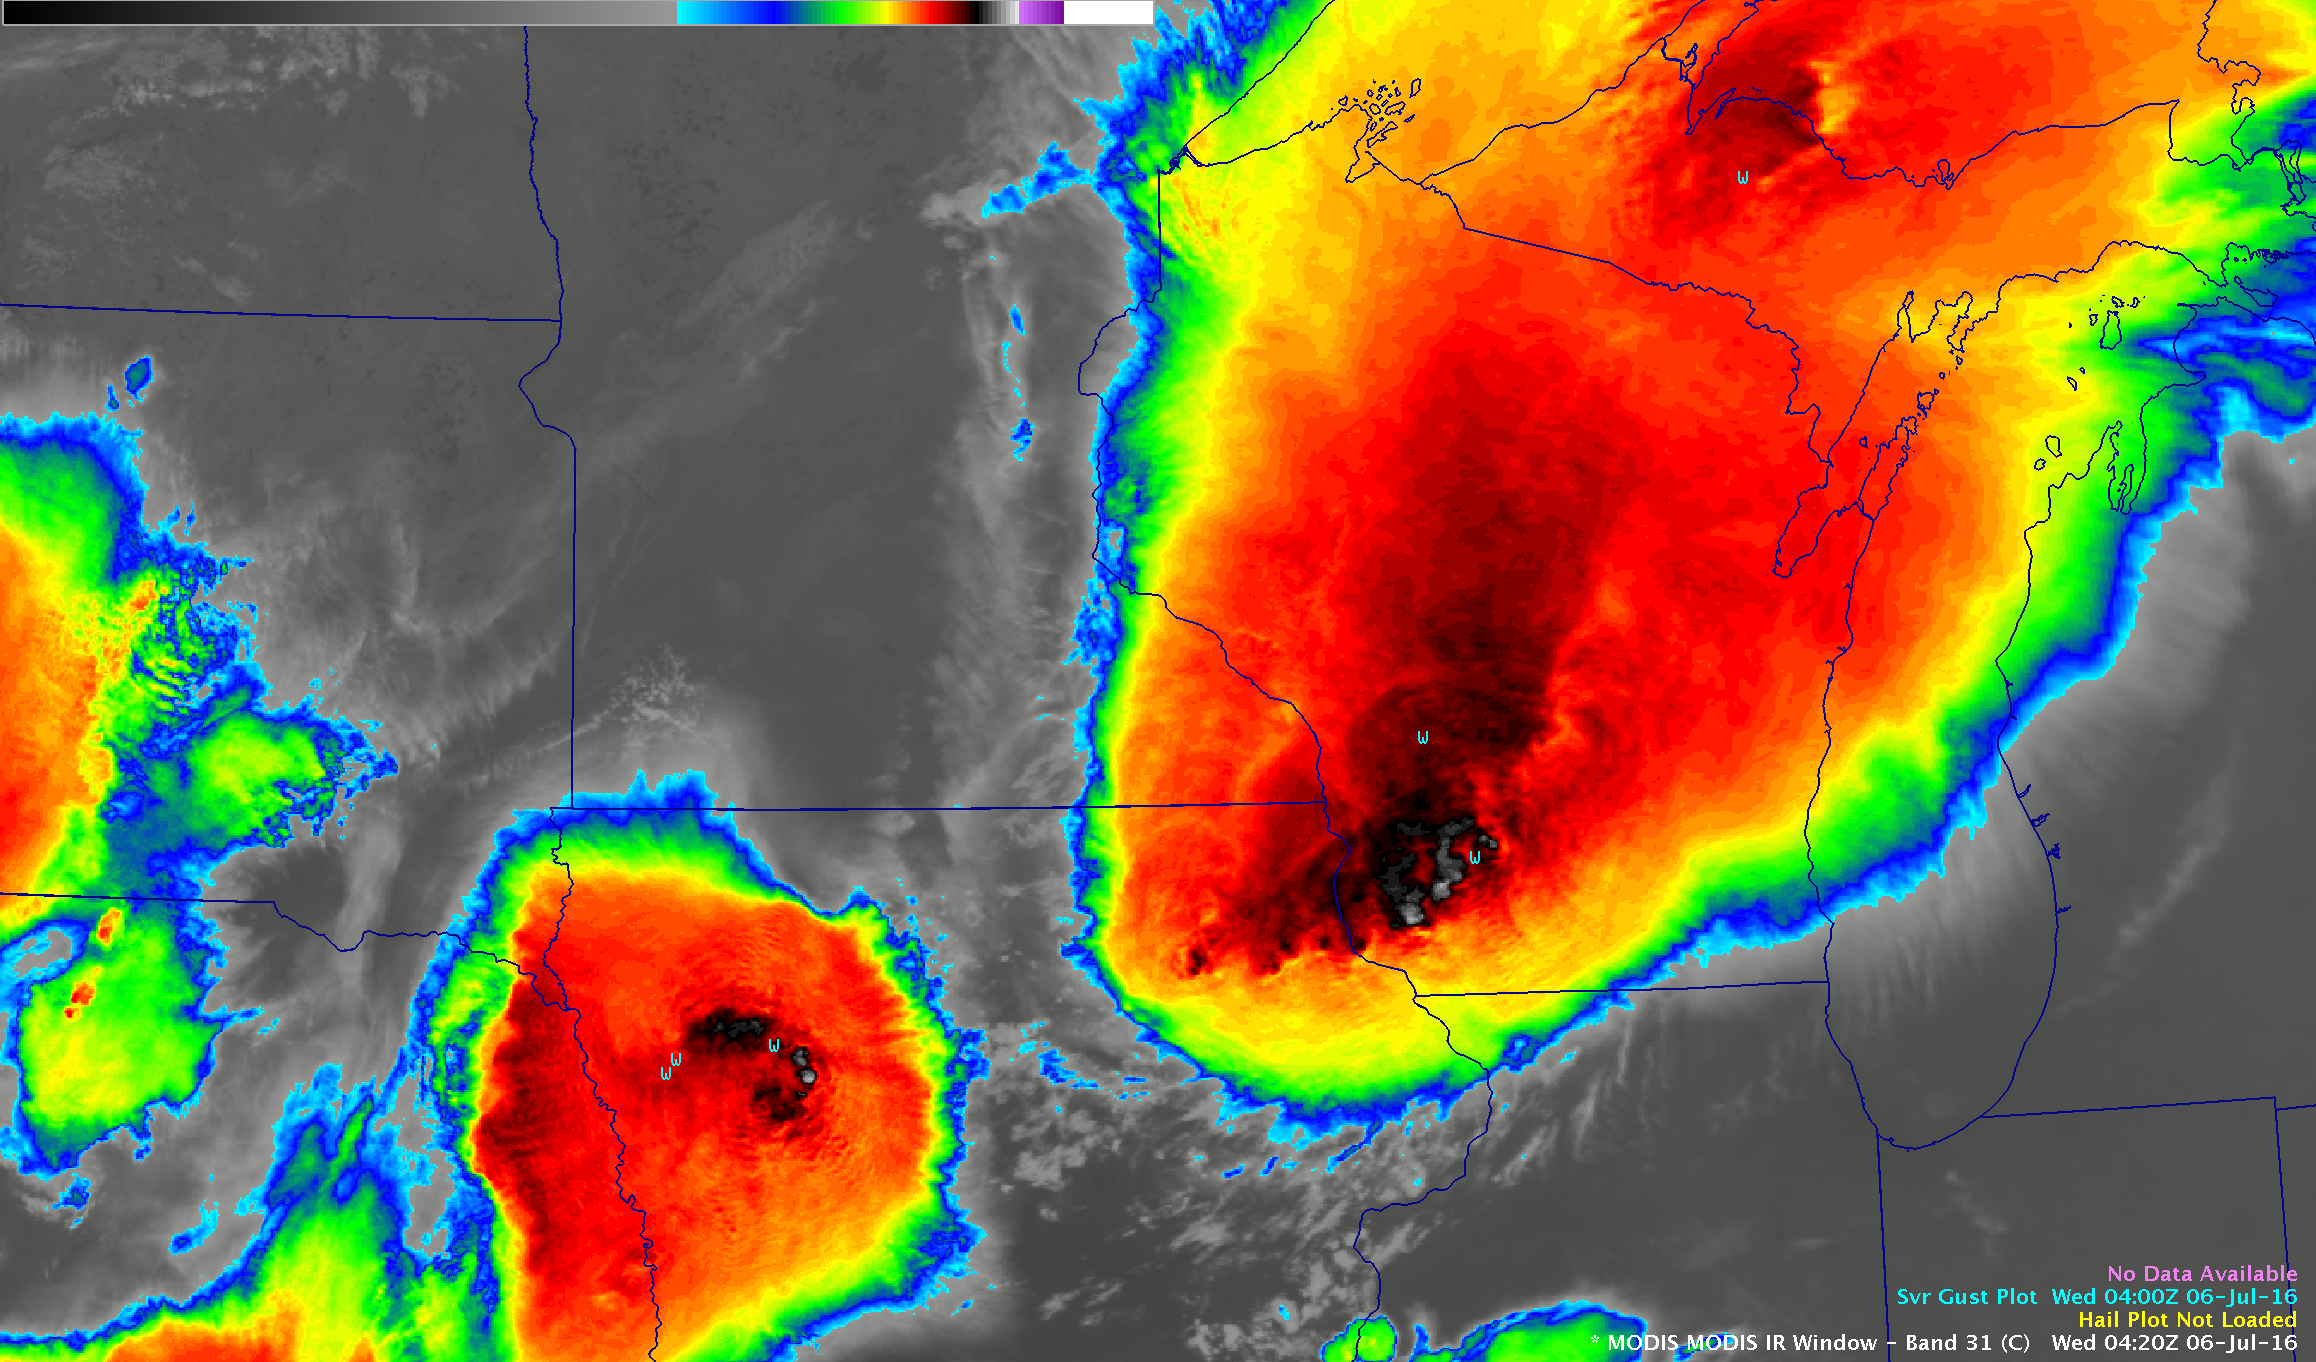 Infrared MODIS (11.0 um), AVHRR (12.0 um) and VIIRS (11.45 um) images, with SPC storm reports [click to play animation]